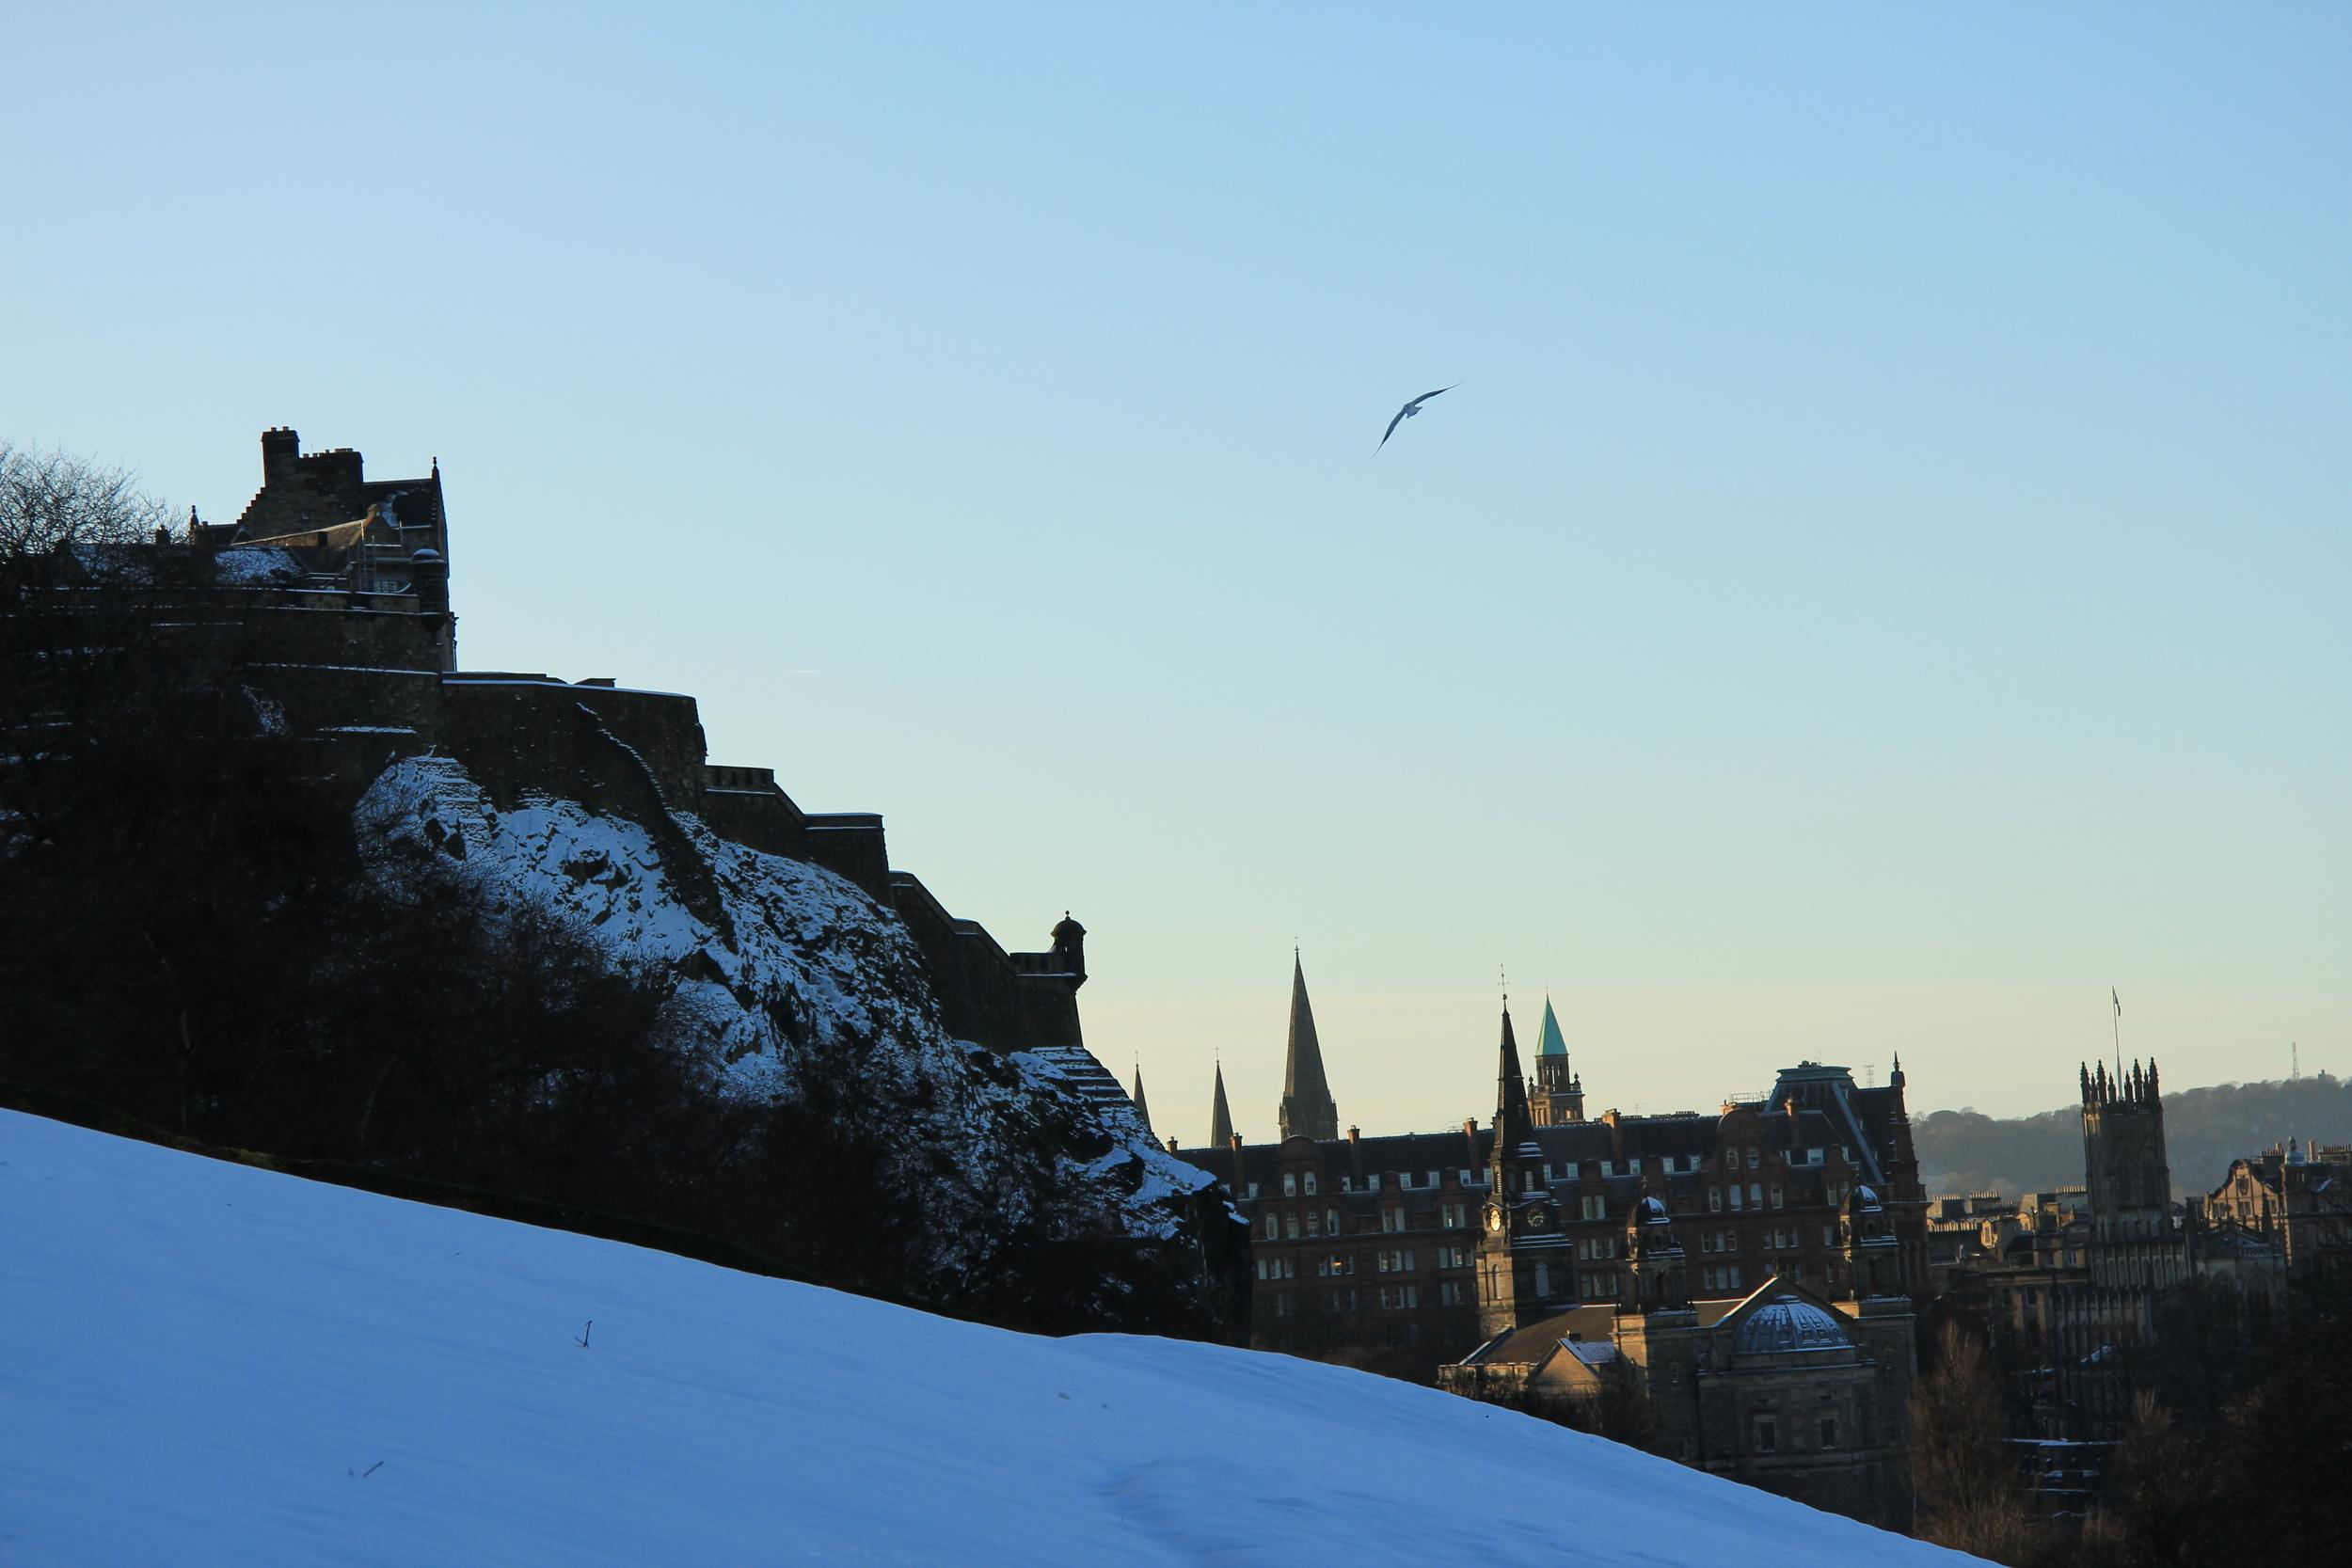 EdnburghEmergencyMedicine-Edinburgh03.JPG